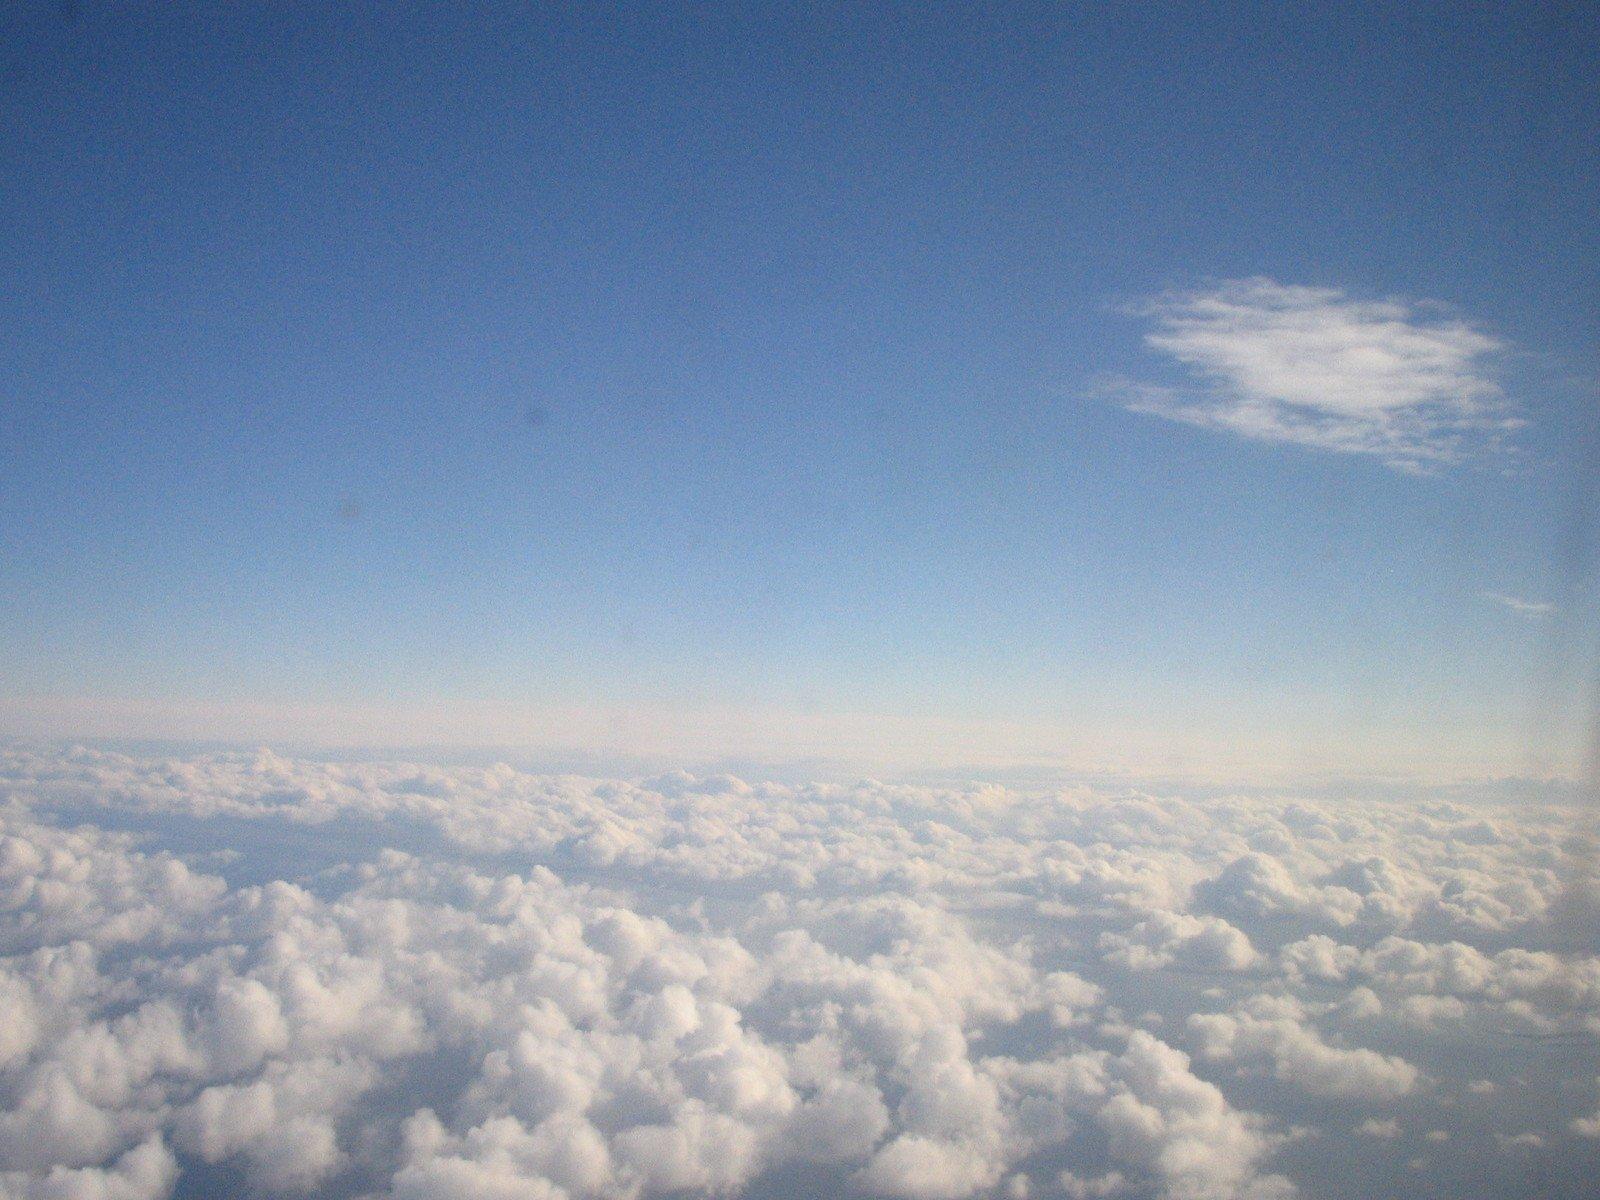 Free cu azul e nuvens stock photo freeimages cu azul e nuvens thecheapjerseys Choice Image